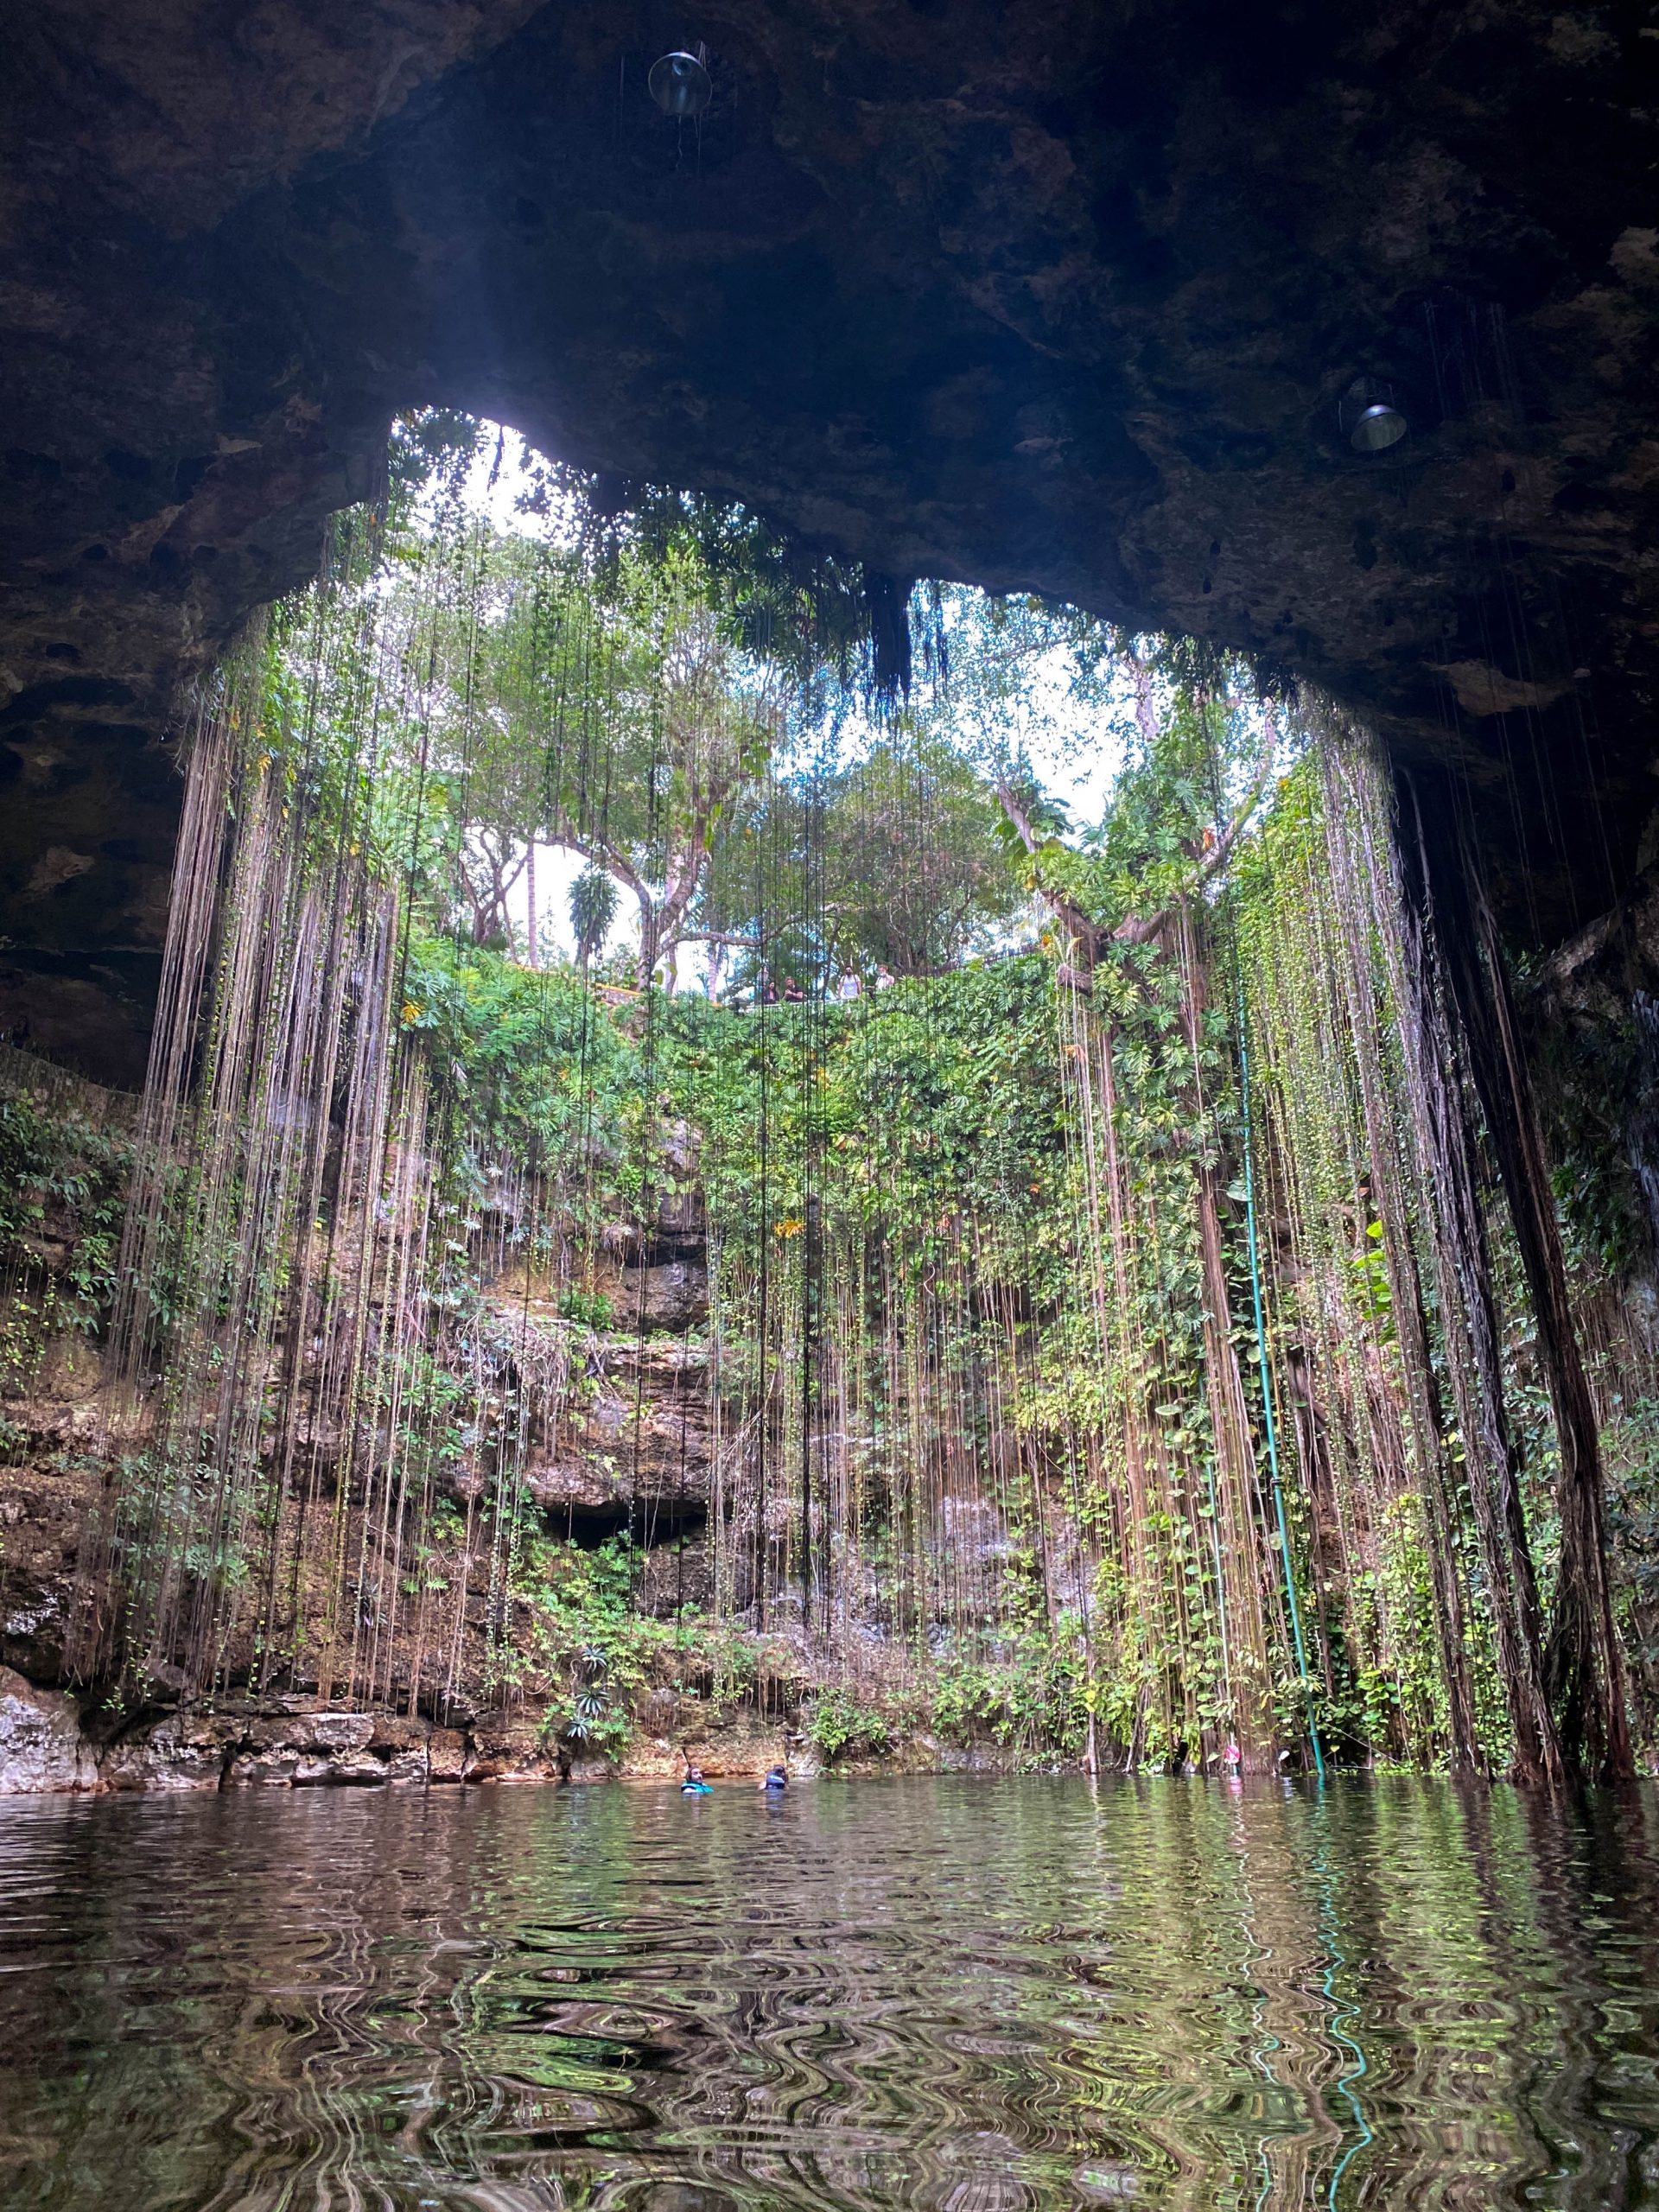 cenote ik kil yucatan mexico sinkhole chichen itza sinkhole instagrammable cenote swimming photo worthy